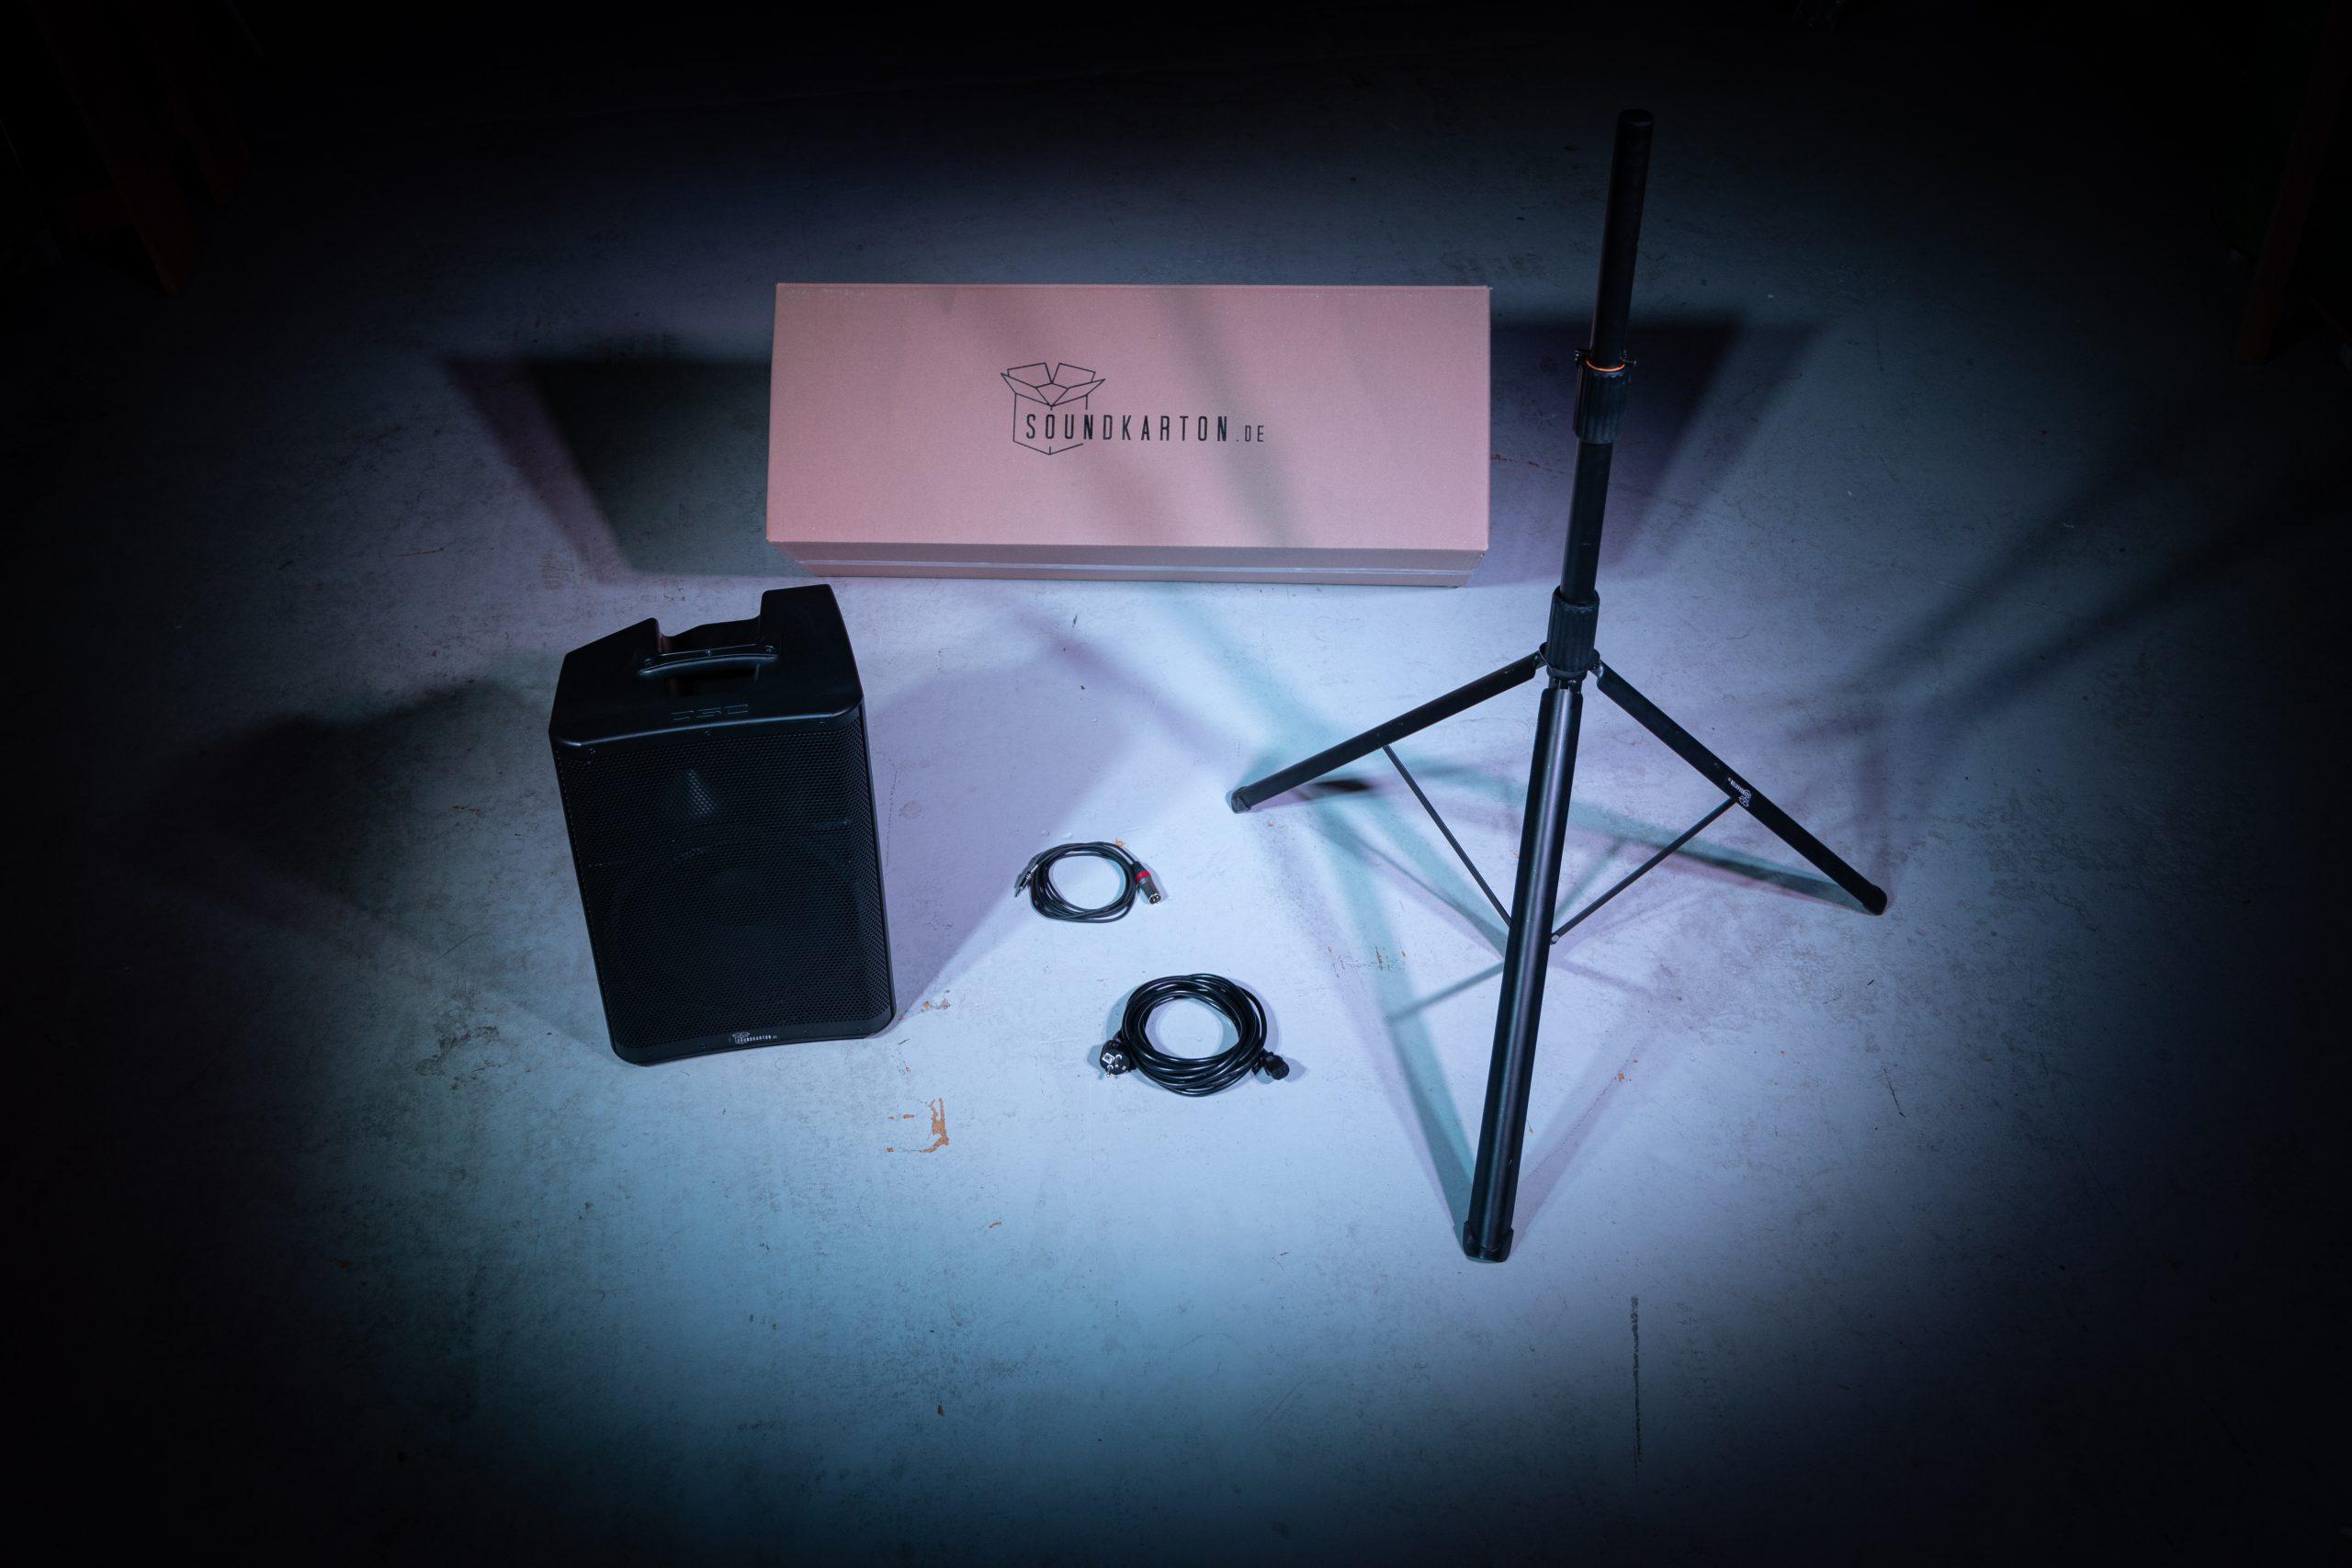 Lautsprecher, Stativ, Stromkabel, 3,5mm Klinke